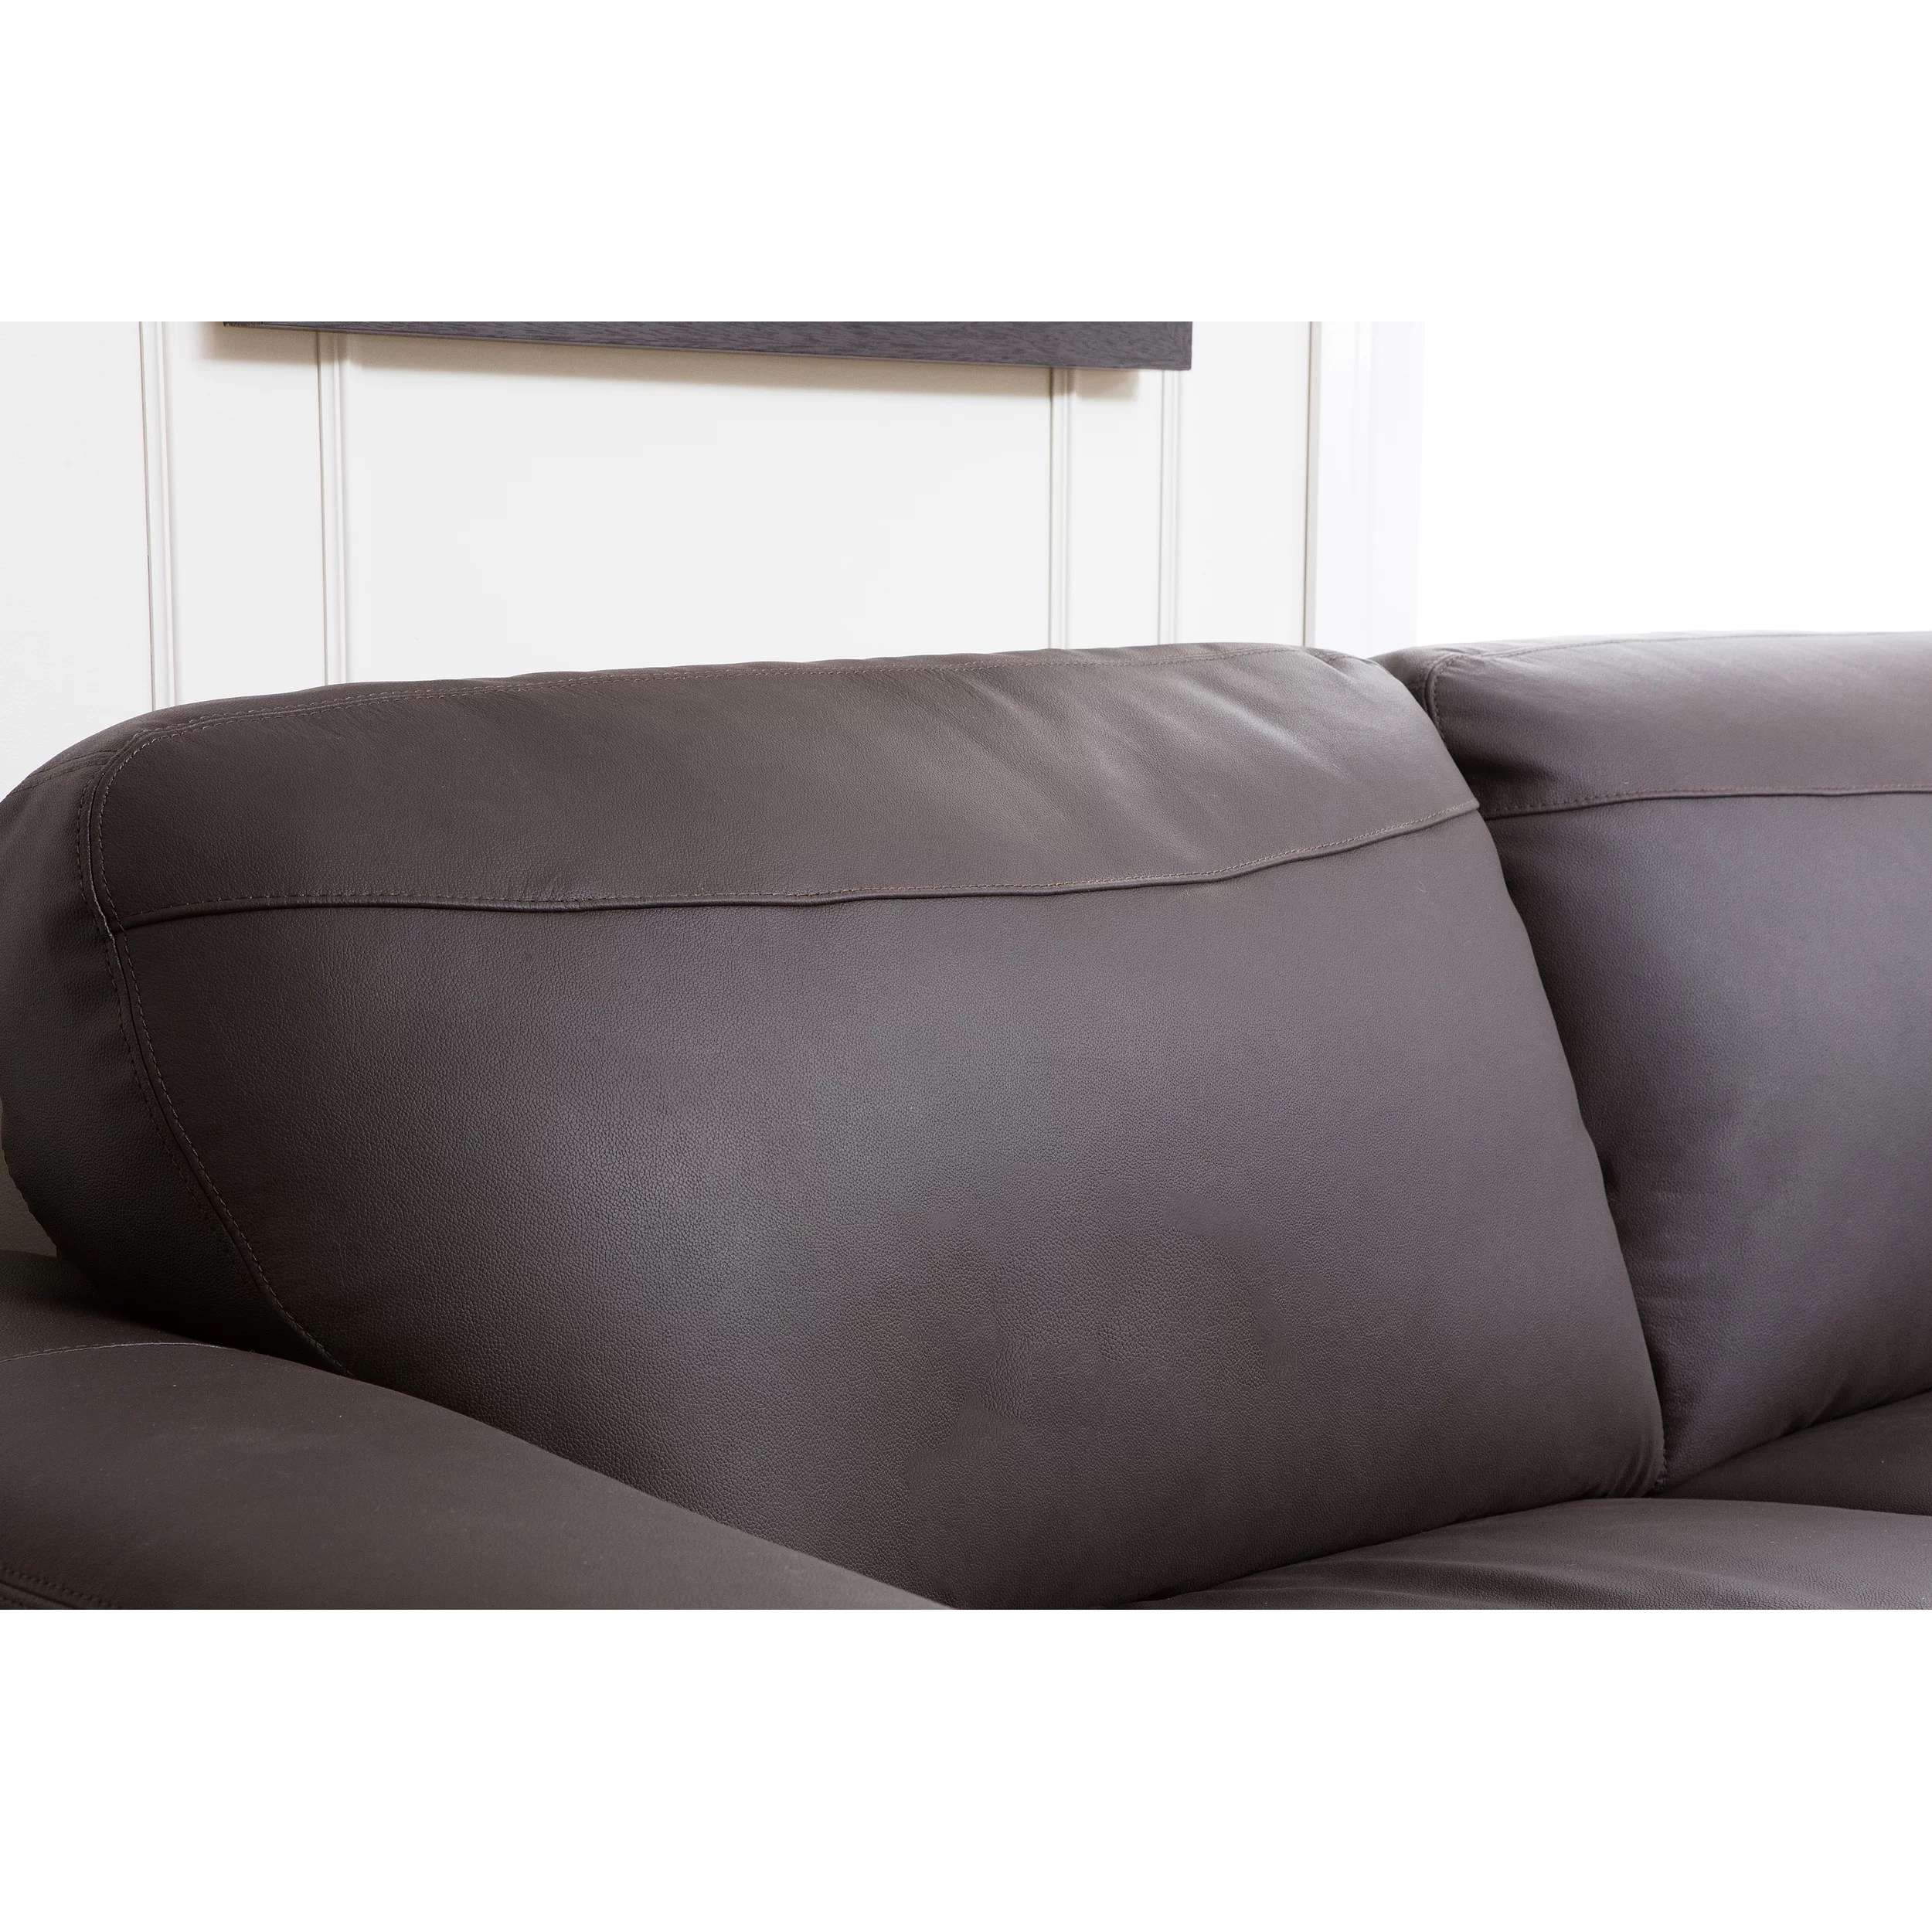 abbyson leather sofa reviews nova black and white corner right hand living ashton wayfair